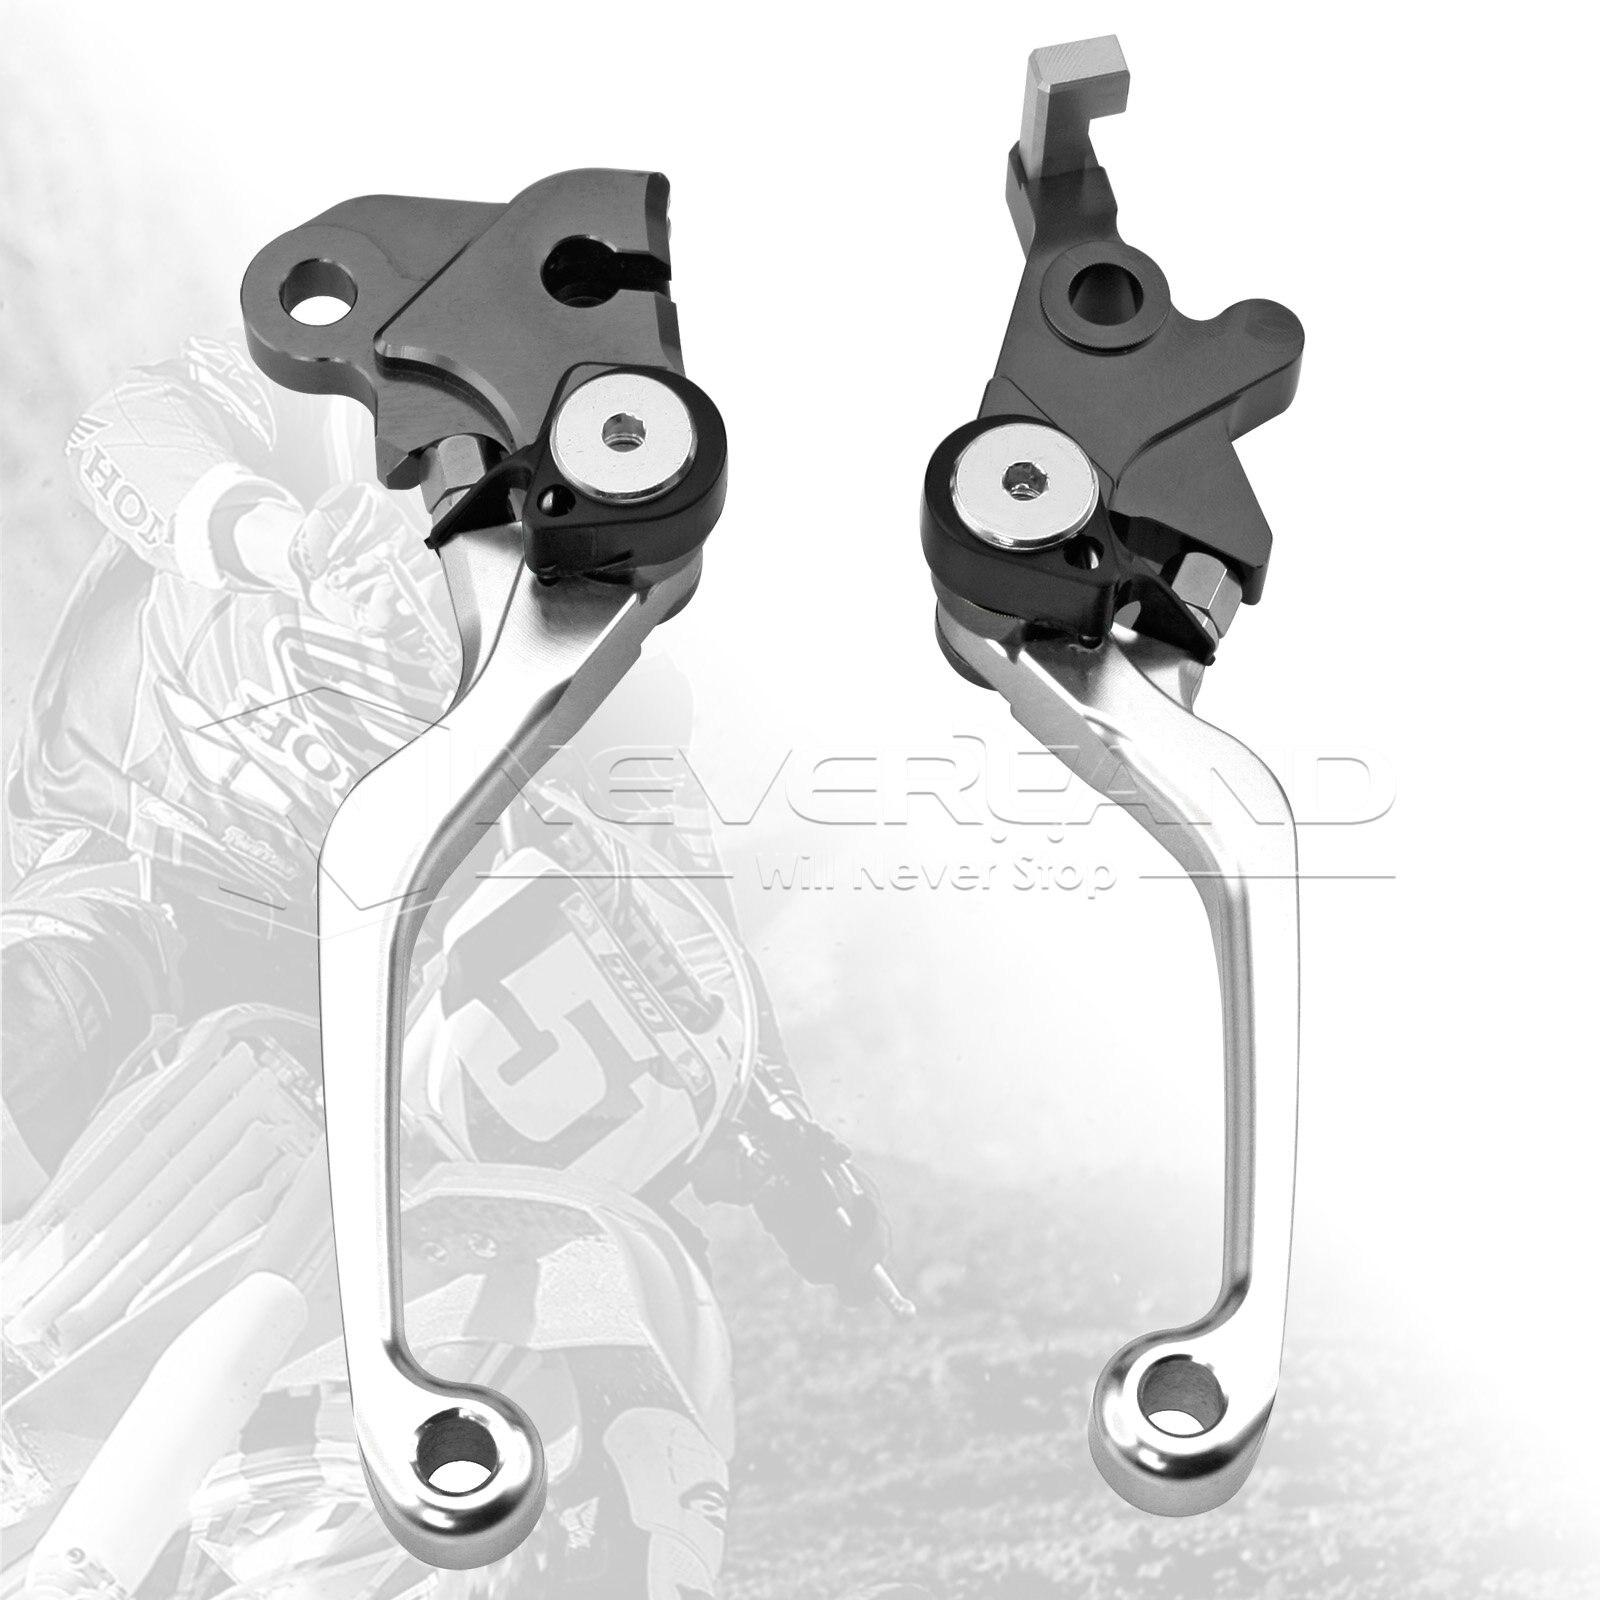 One Pair CNC Pivot Brake Clutch Levers For Honda SL230 1997-2004 XR230/MOTARD 2005-2012 L03K/R05K Silver D10<br><br>Aliexpress